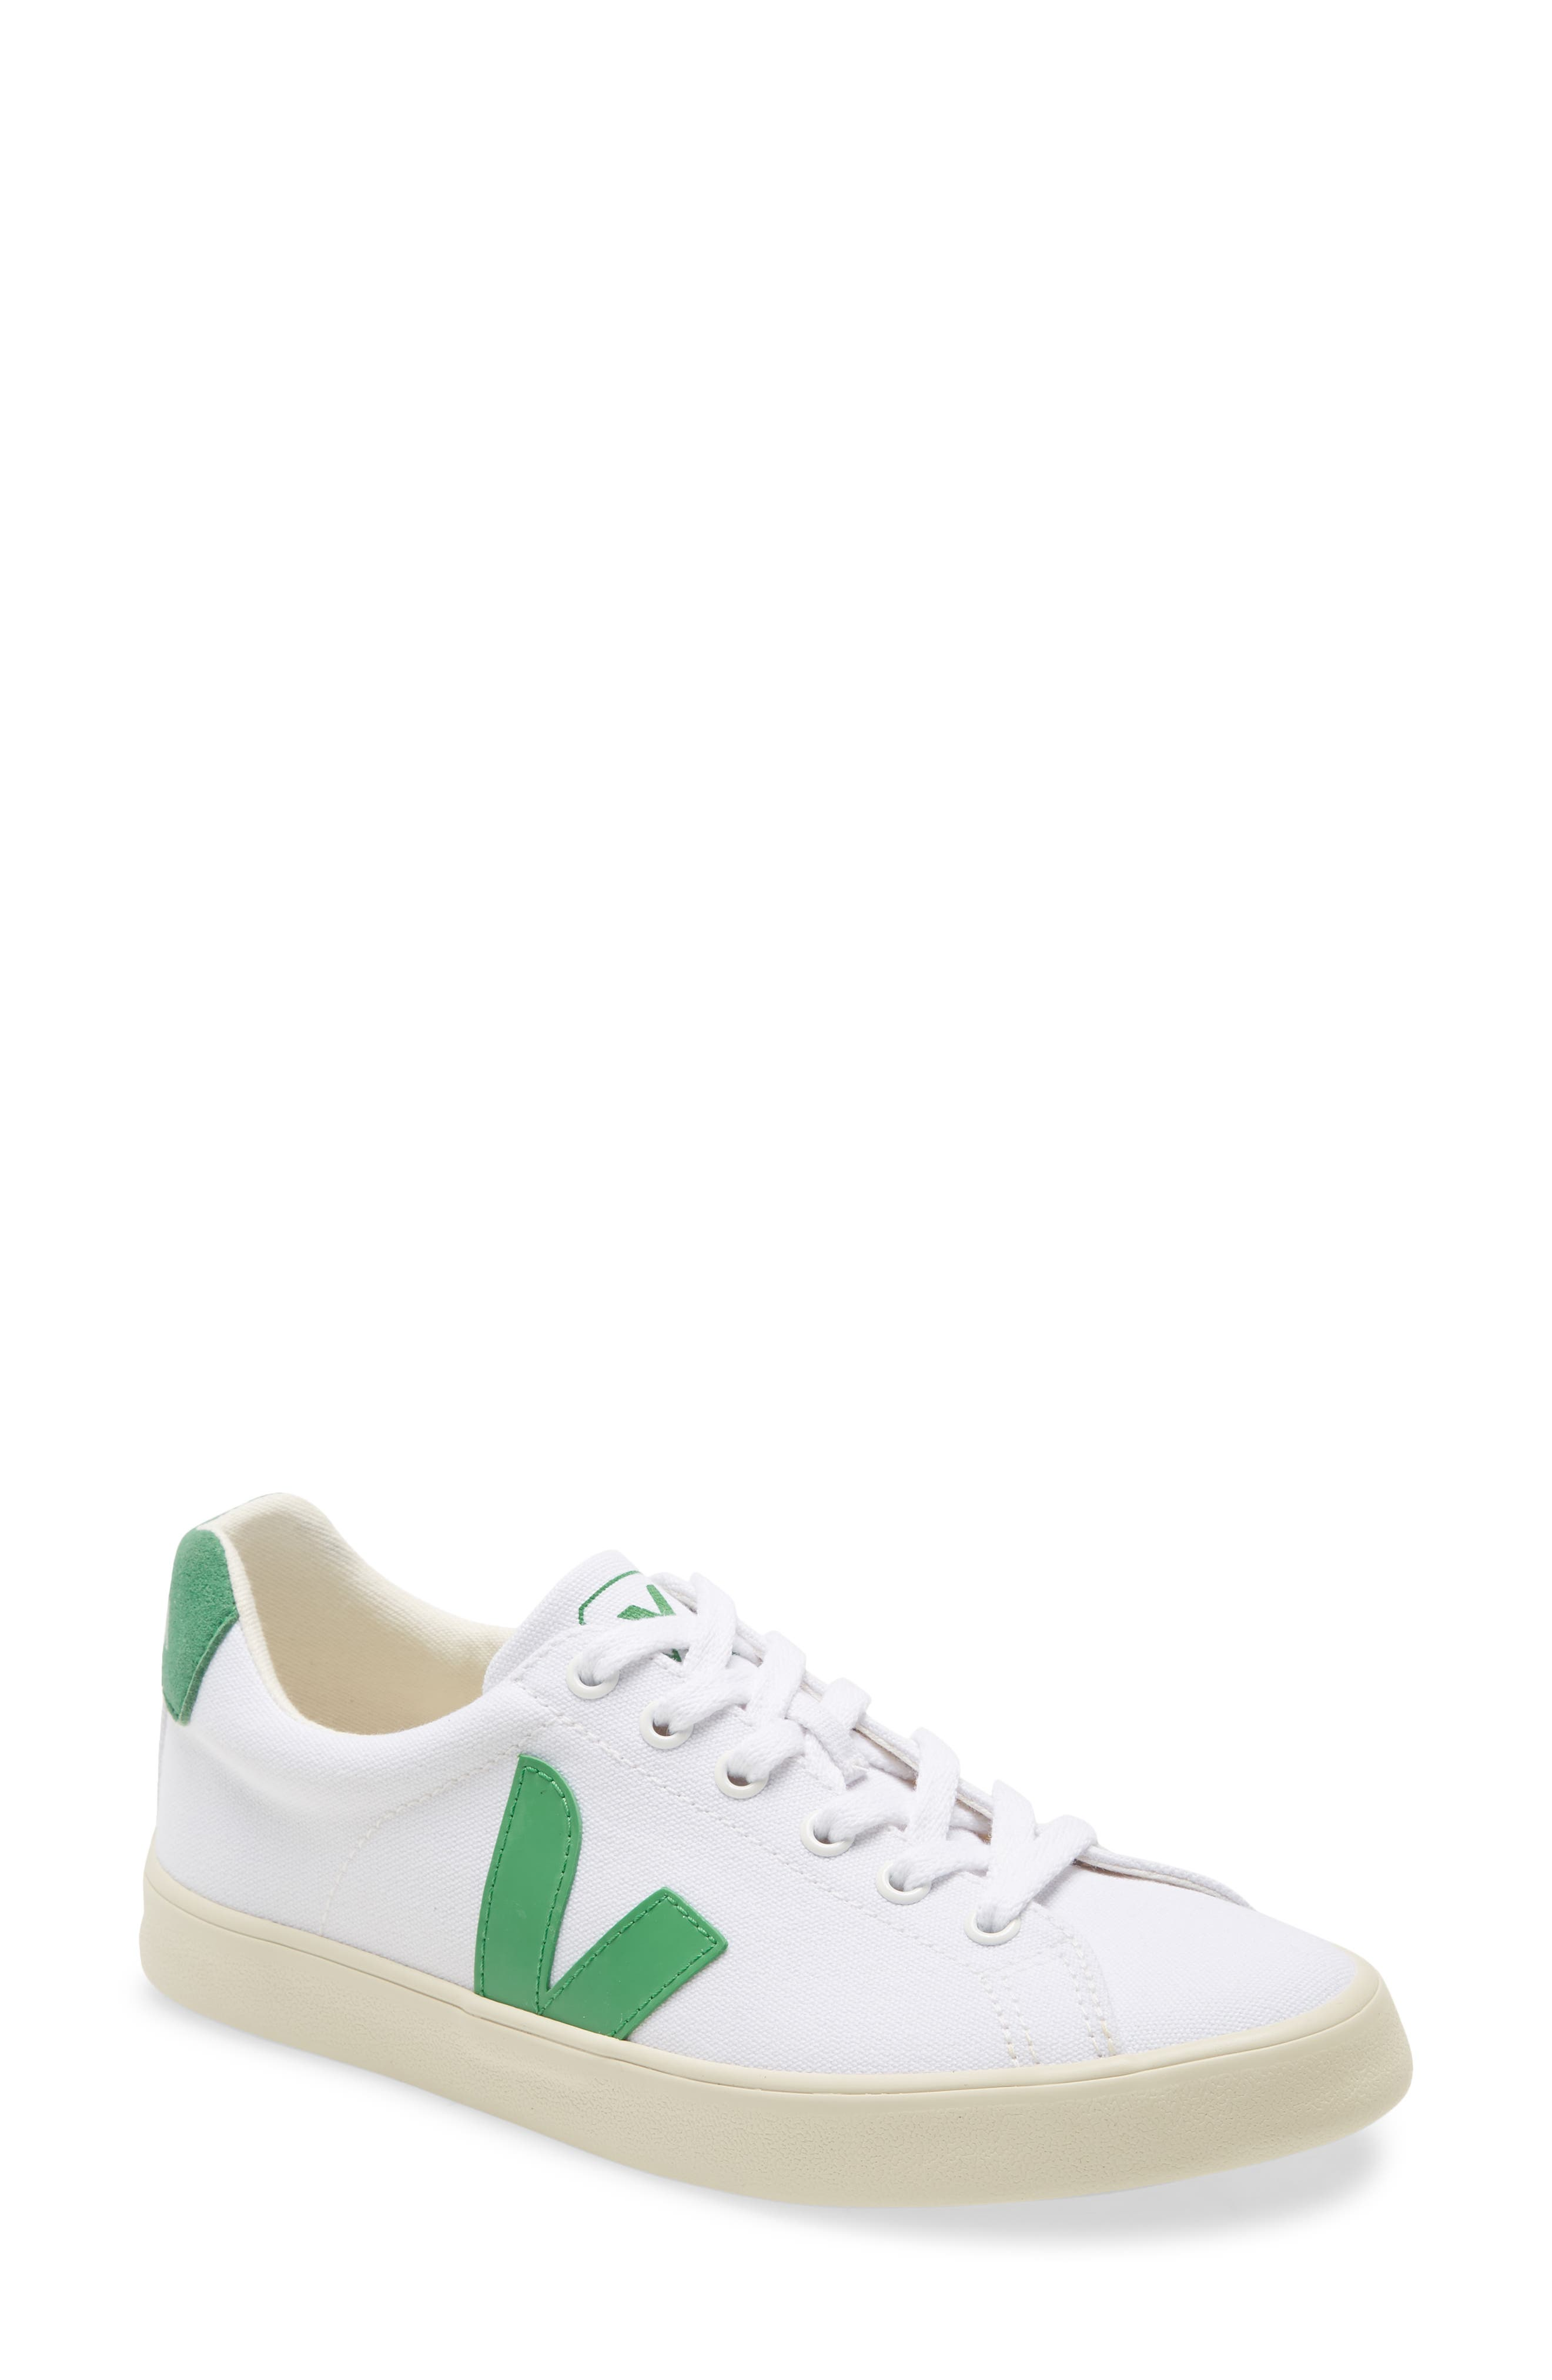 Women's Veja Shoes Sale \u0026 Clearance